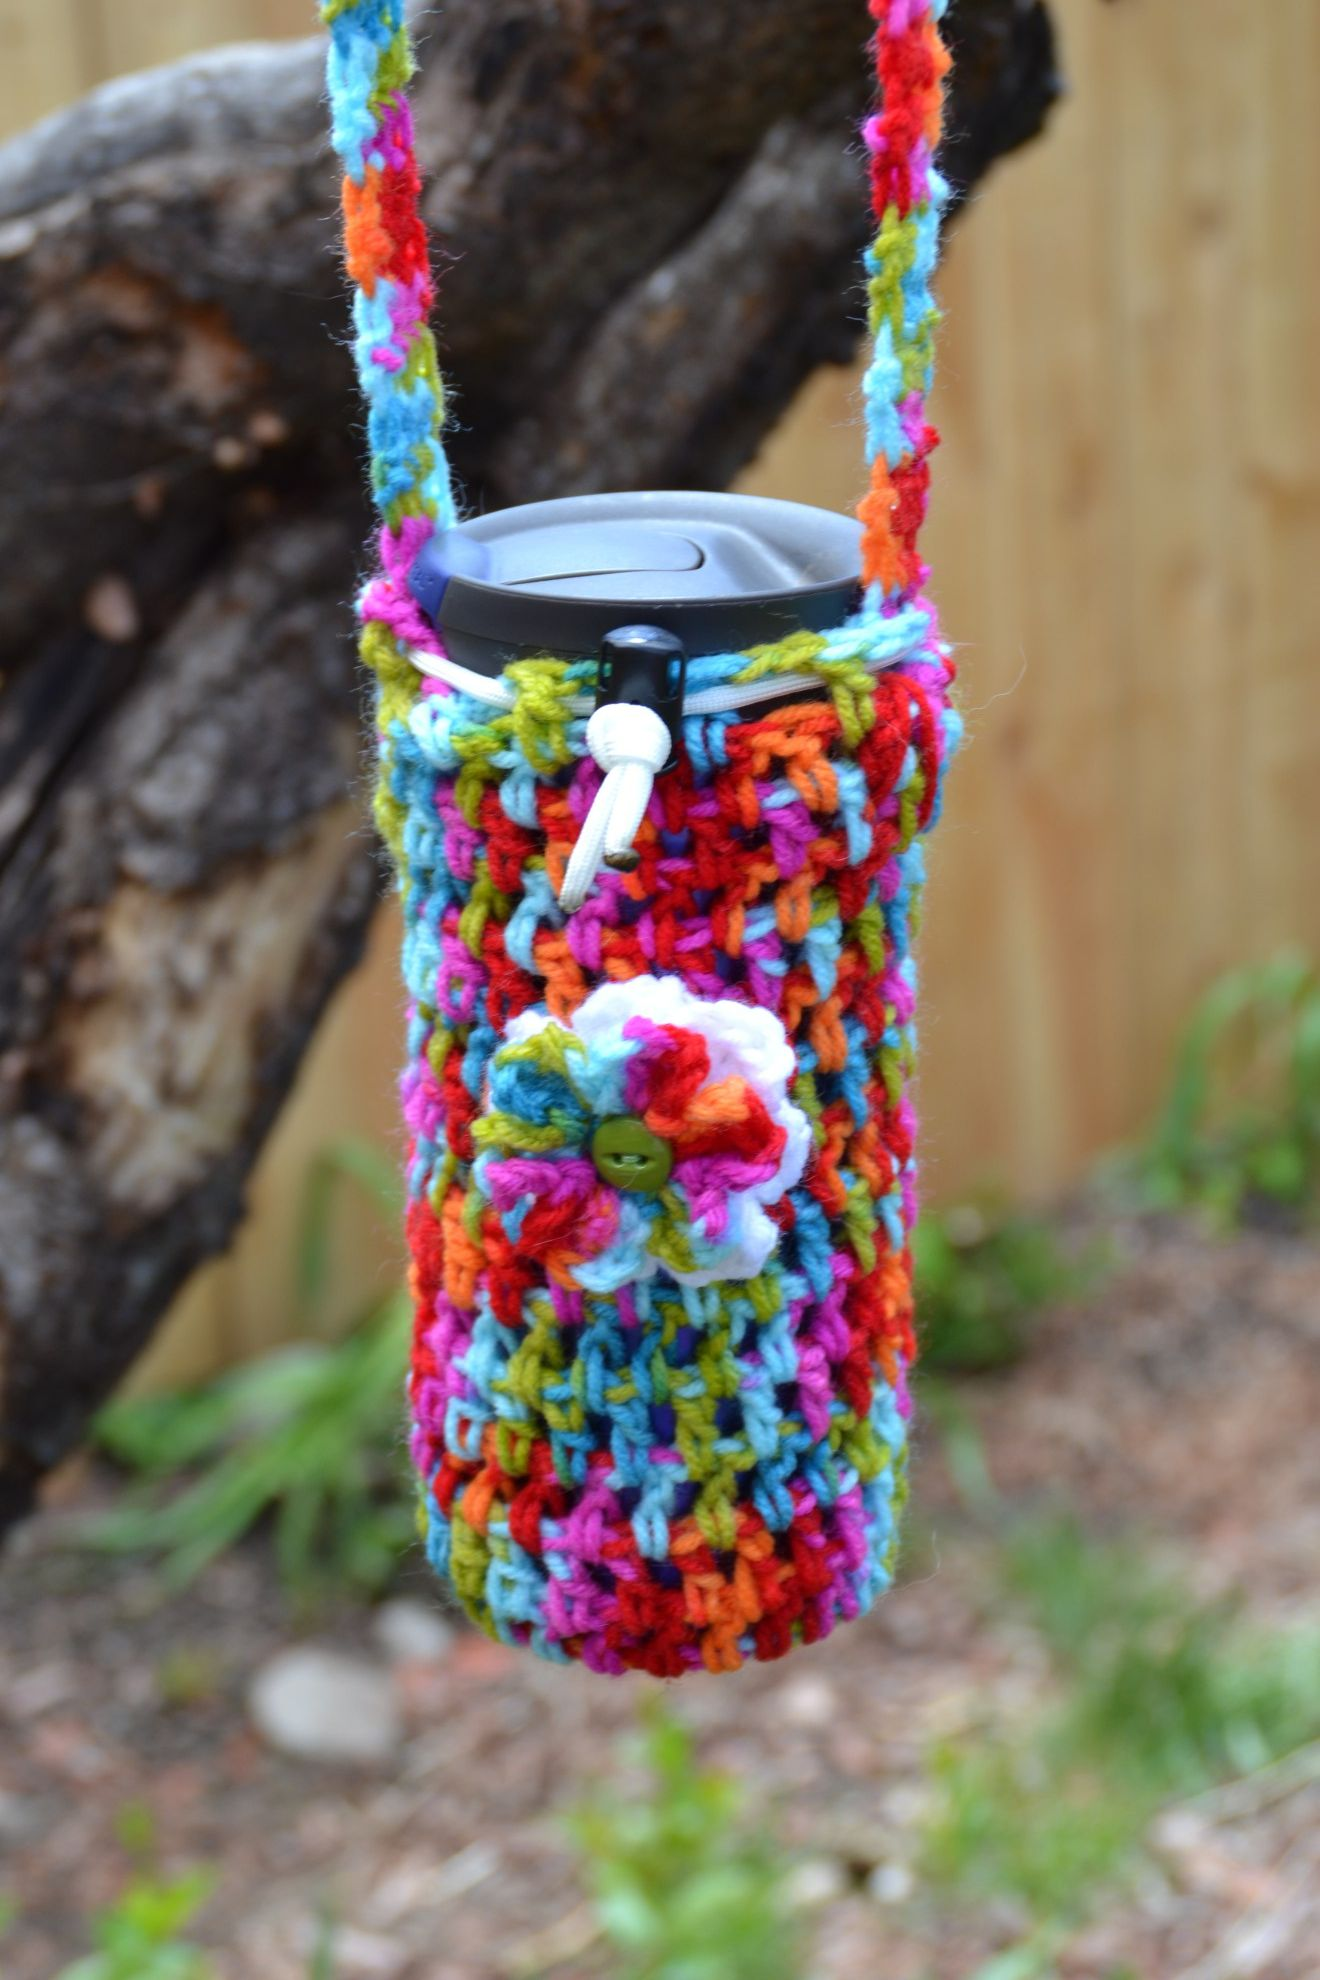 Easy crochet water bottle holder great for crochet beginners easy crochet water bottle holder great for crochet beginners free pattern bankloansurffo Choice Image